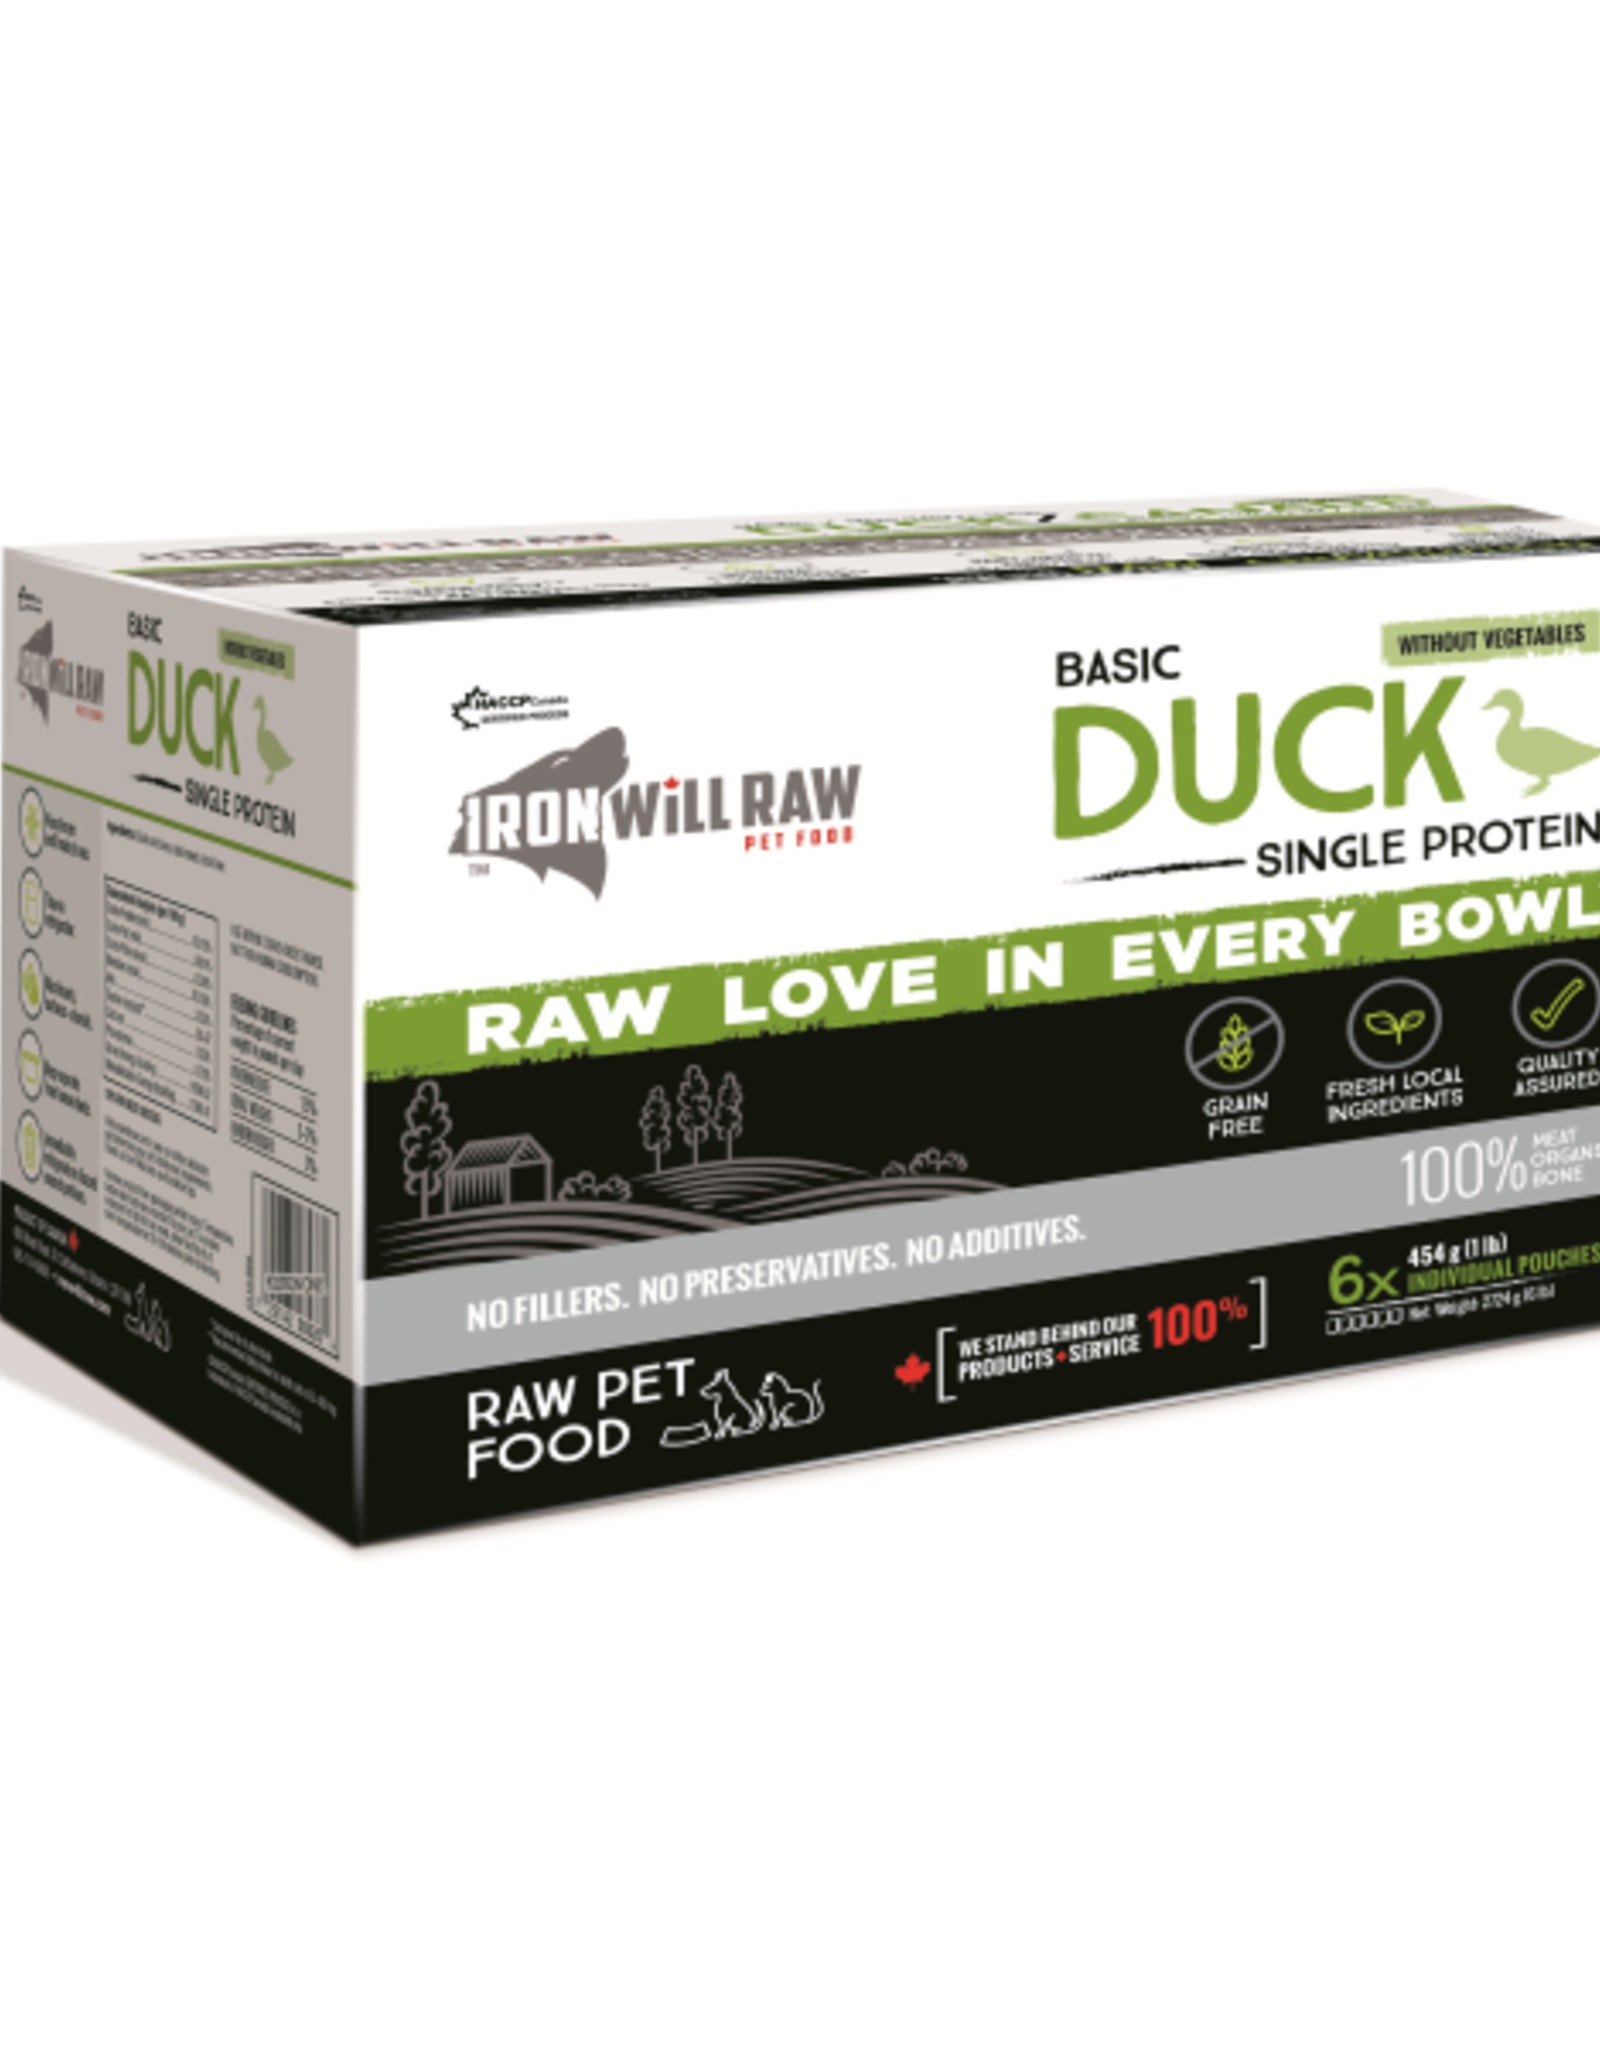 IRON WILL RAW Iron Will Raw Dog GF Basic Duck Single Protein 6/1 lb